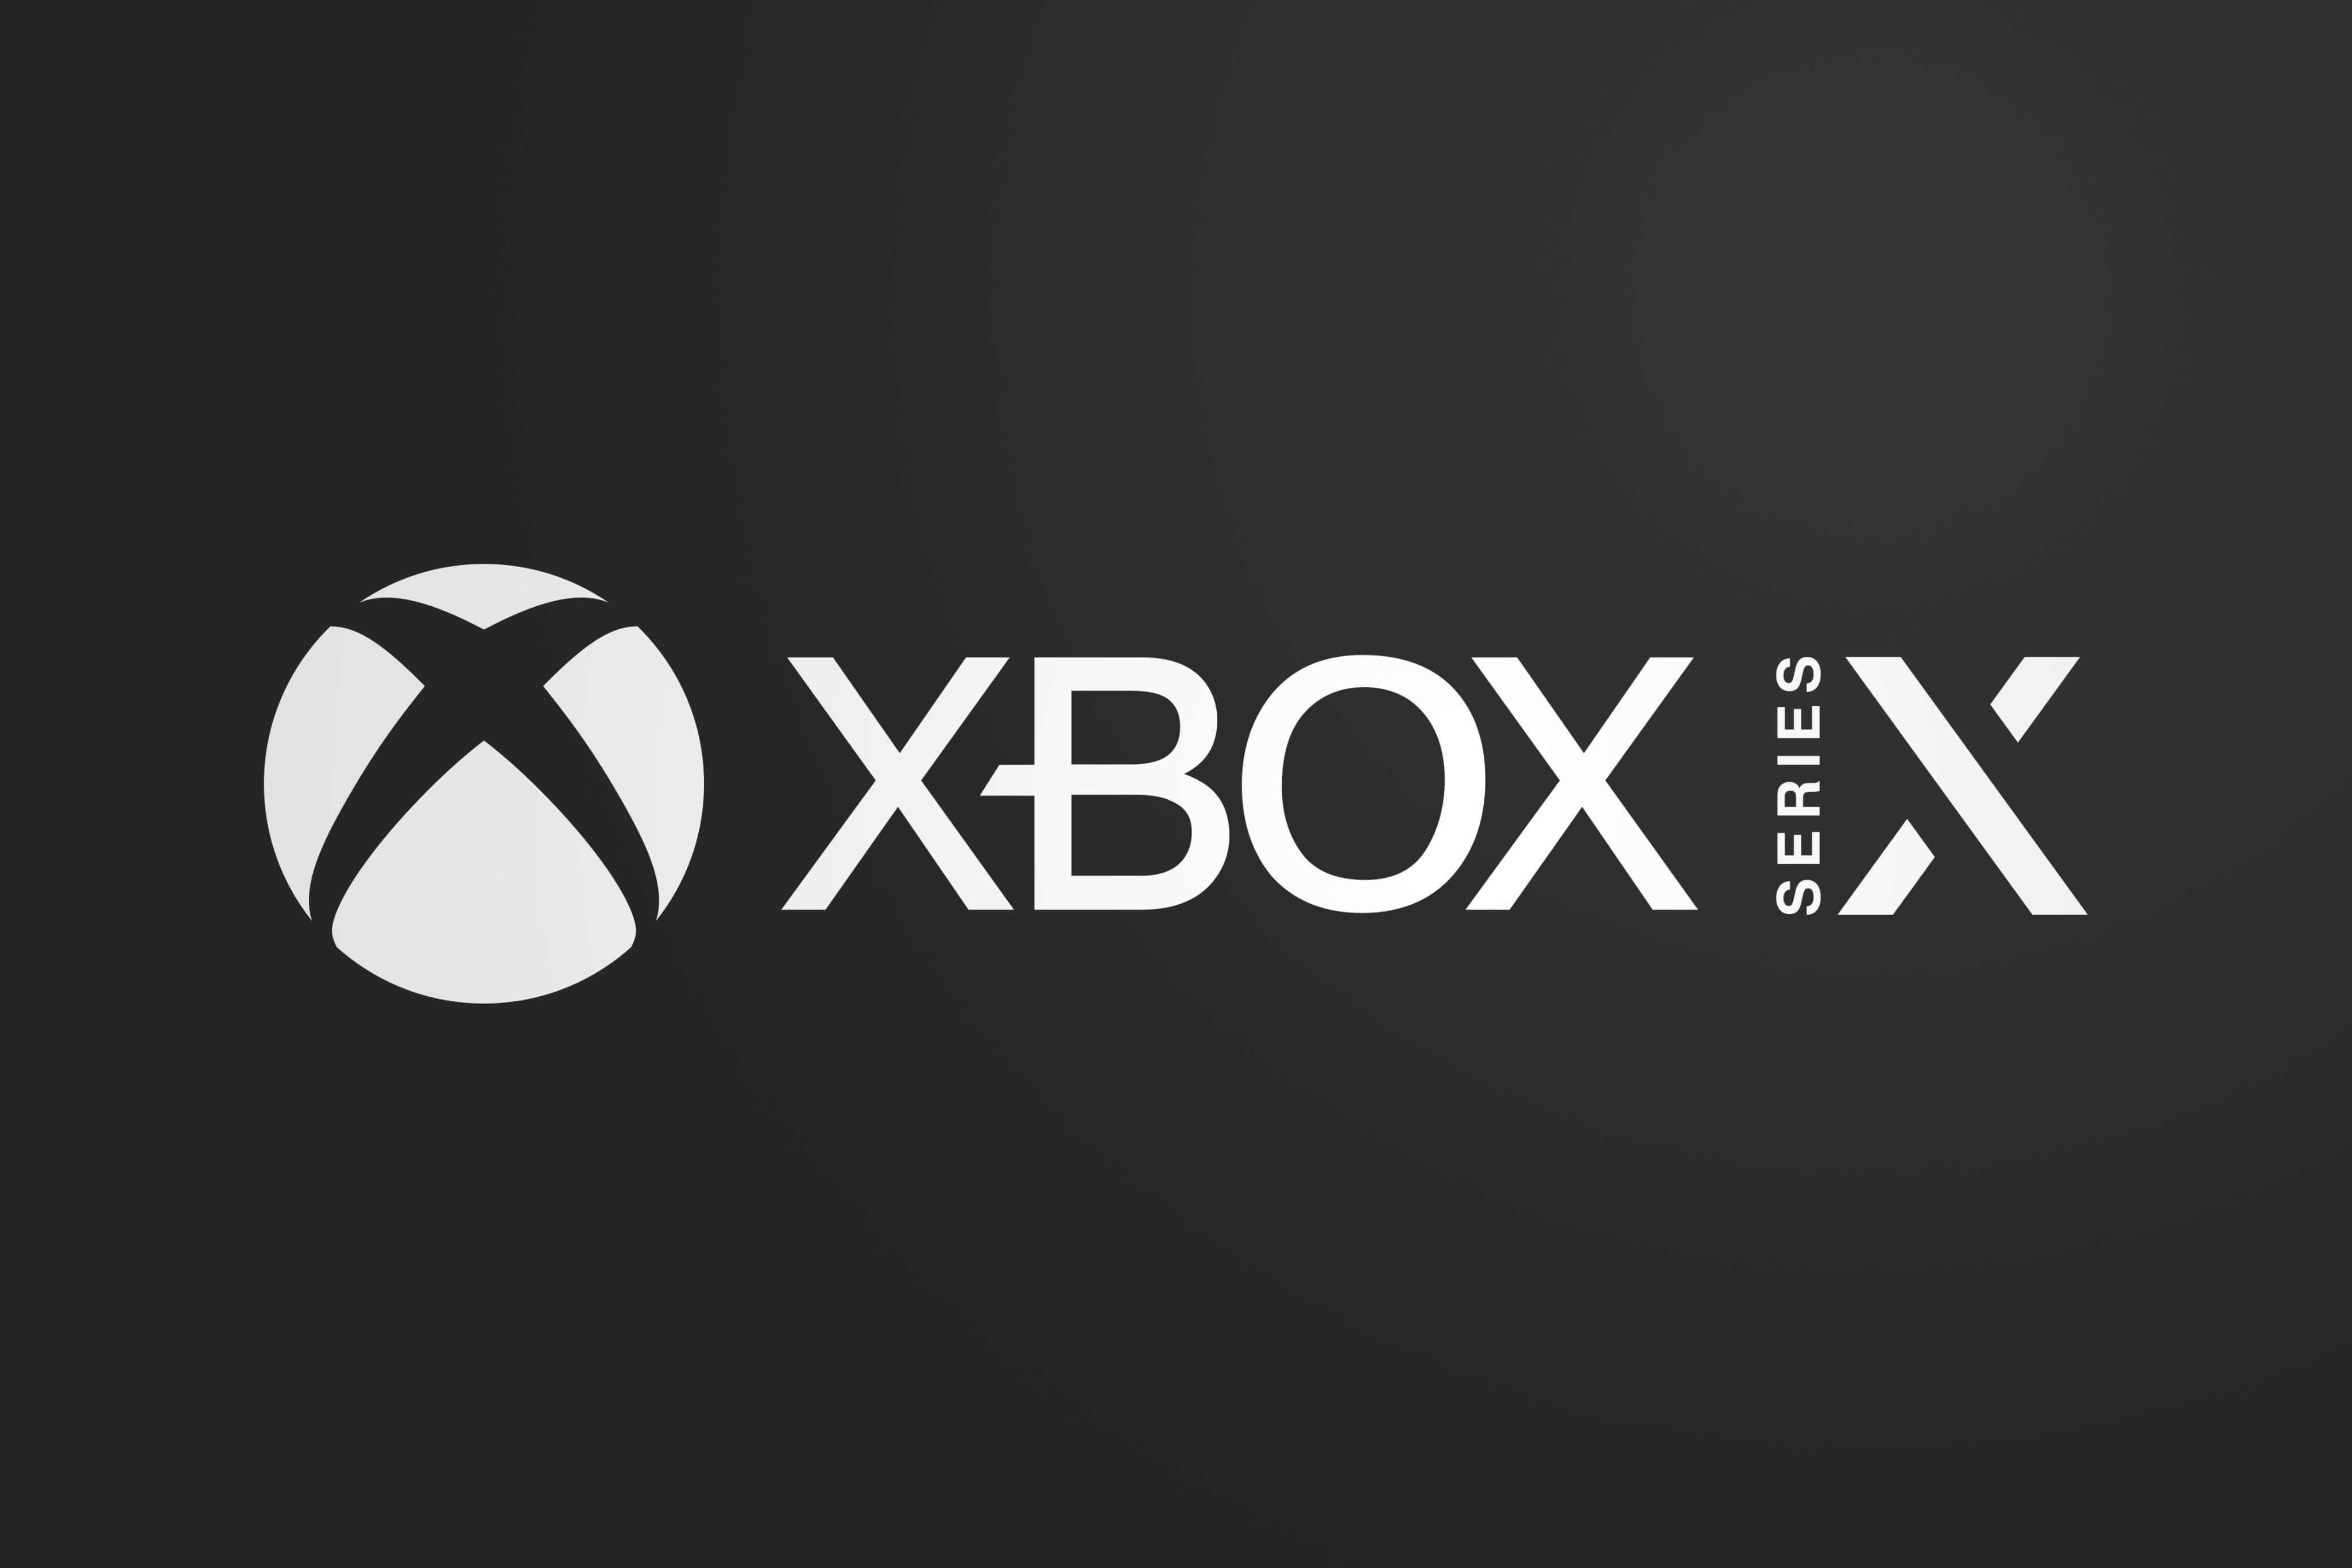 Xbox Series X By Playbox Wallpapers Wallpaperhub